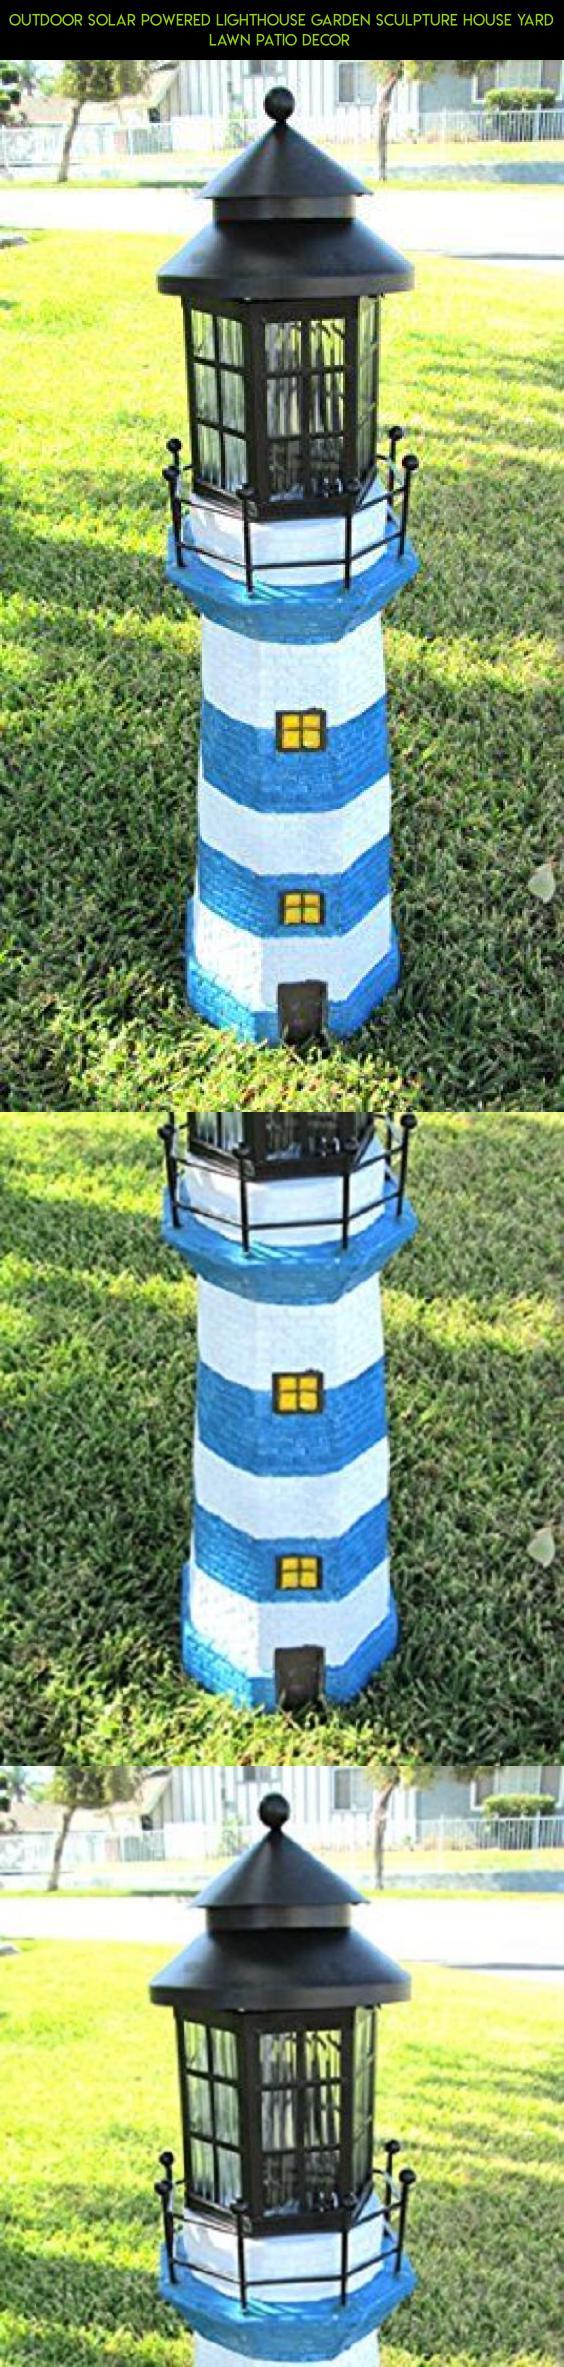 Outdoor Solar Powered Lighthouse Garden Sculpture House Yard Lawn ...